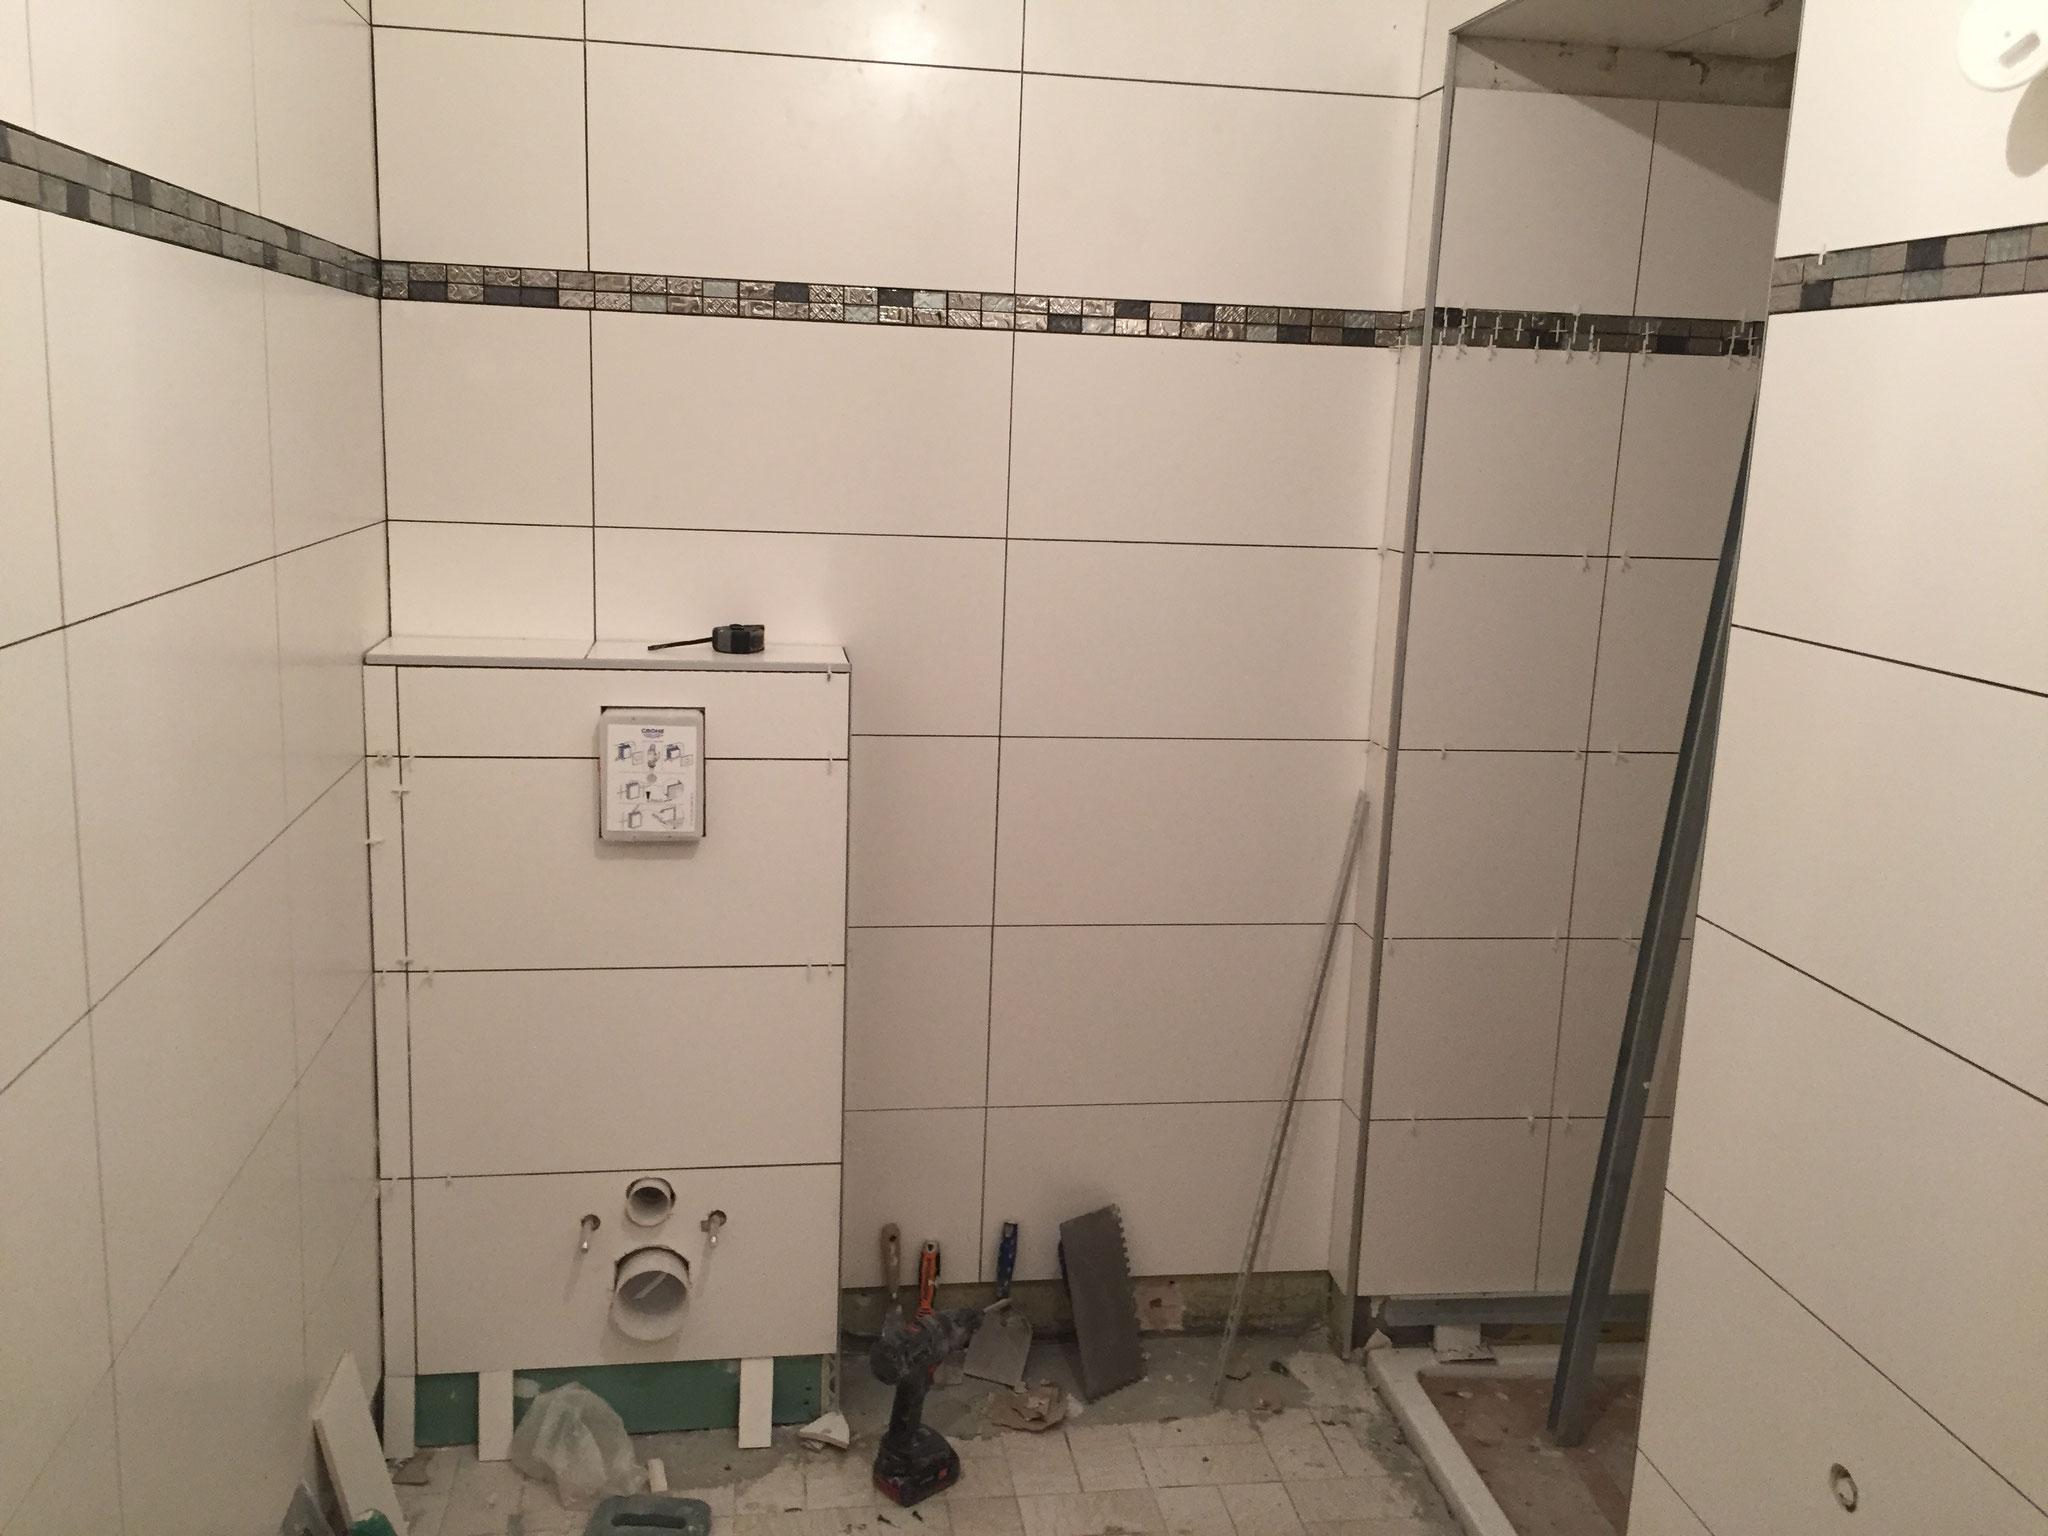 Habillage WC suspendu Activ Renovation Strasbourg 67